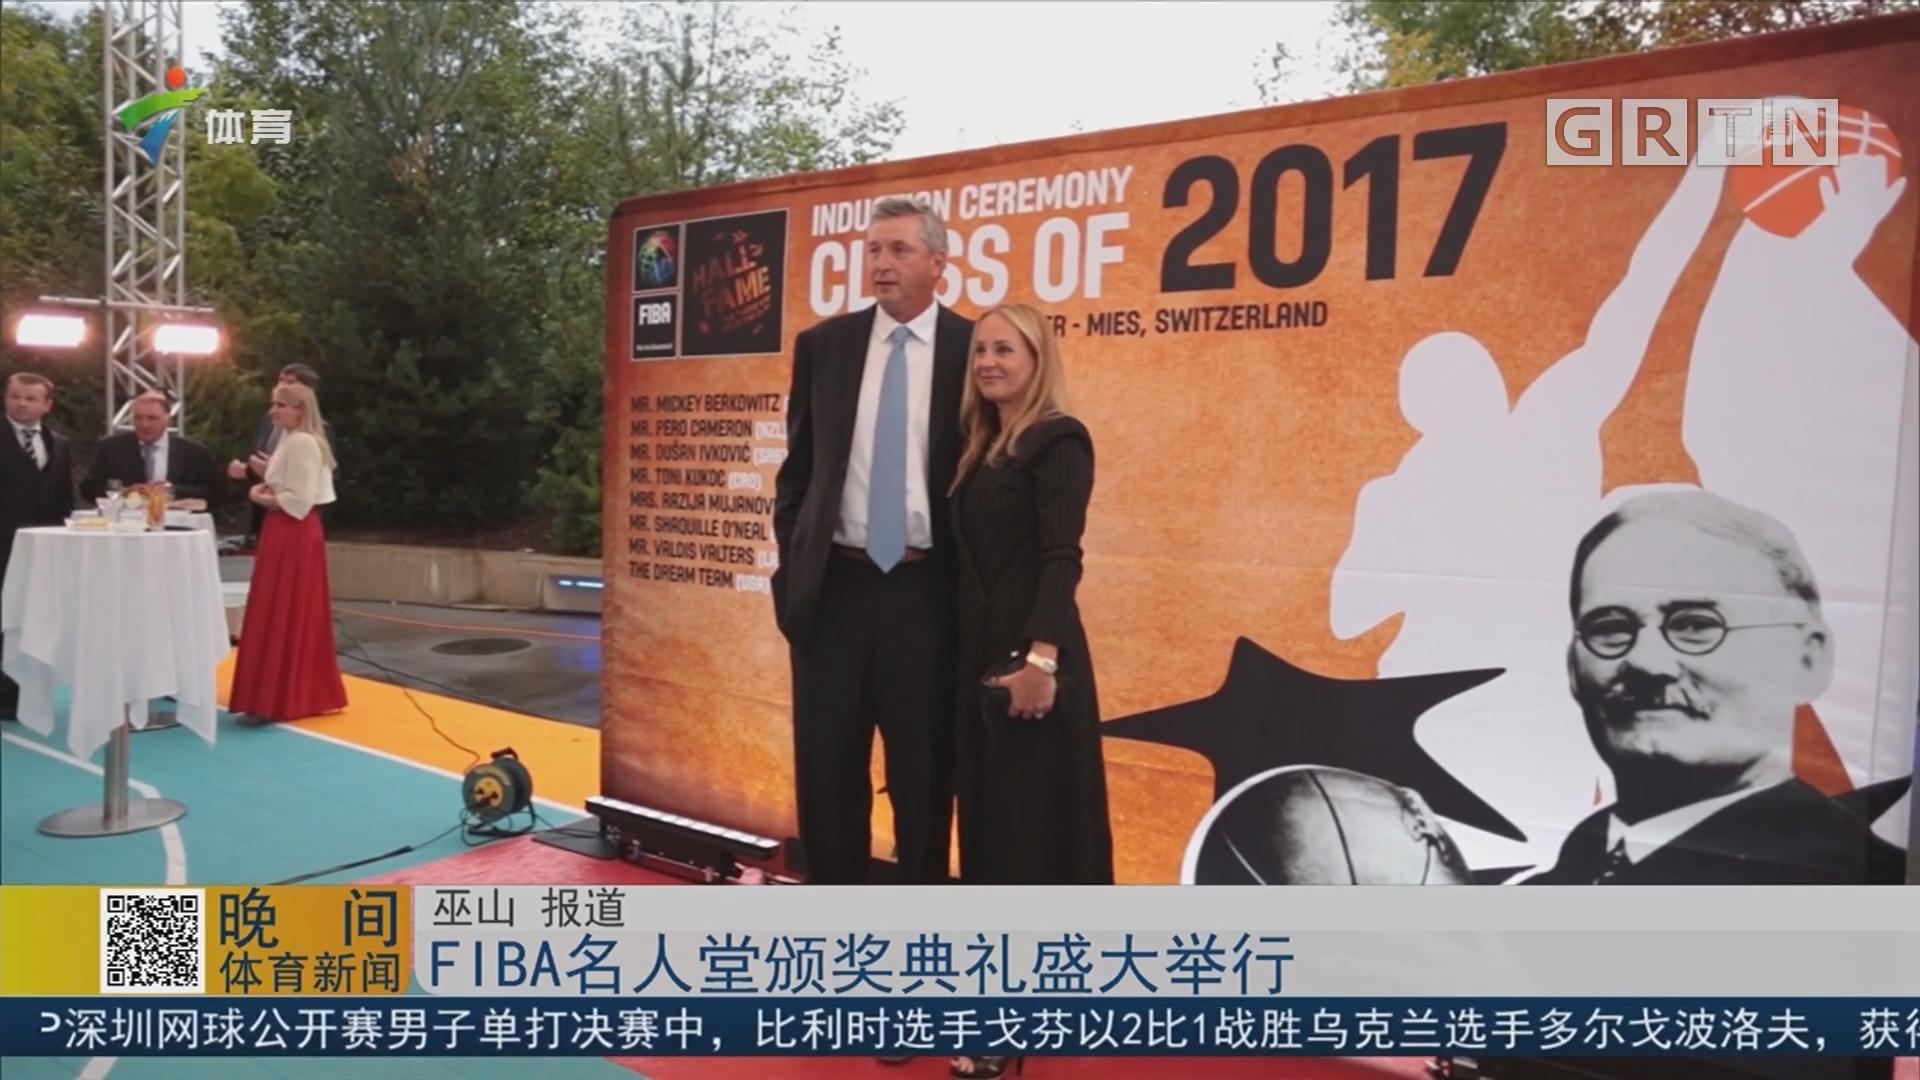 FIBA名人堂颁奖典礼盛大举行